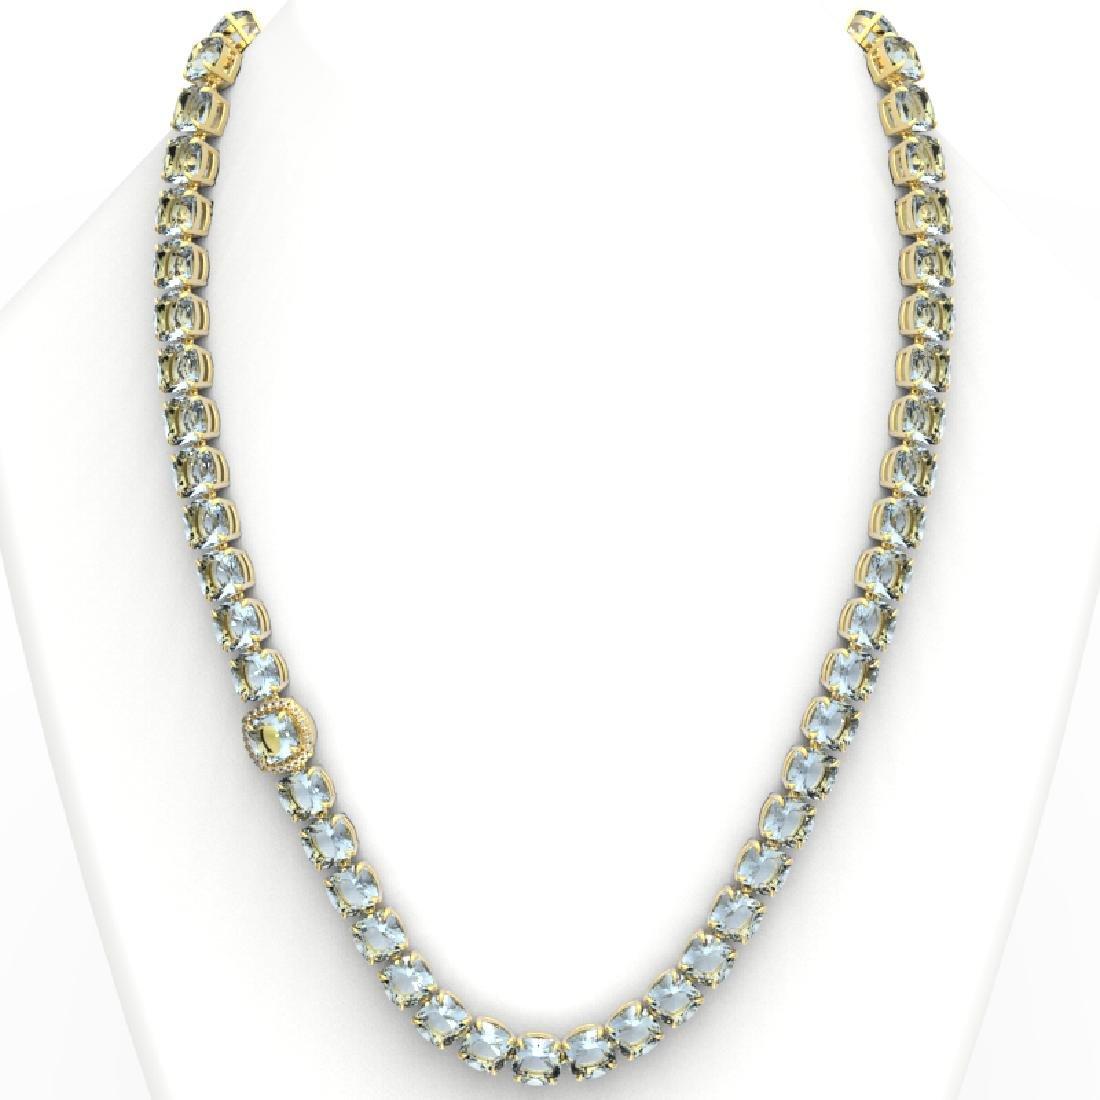 87 CTW Aquamarine & VS/SI Diamond Halo Micro Necklace - 3